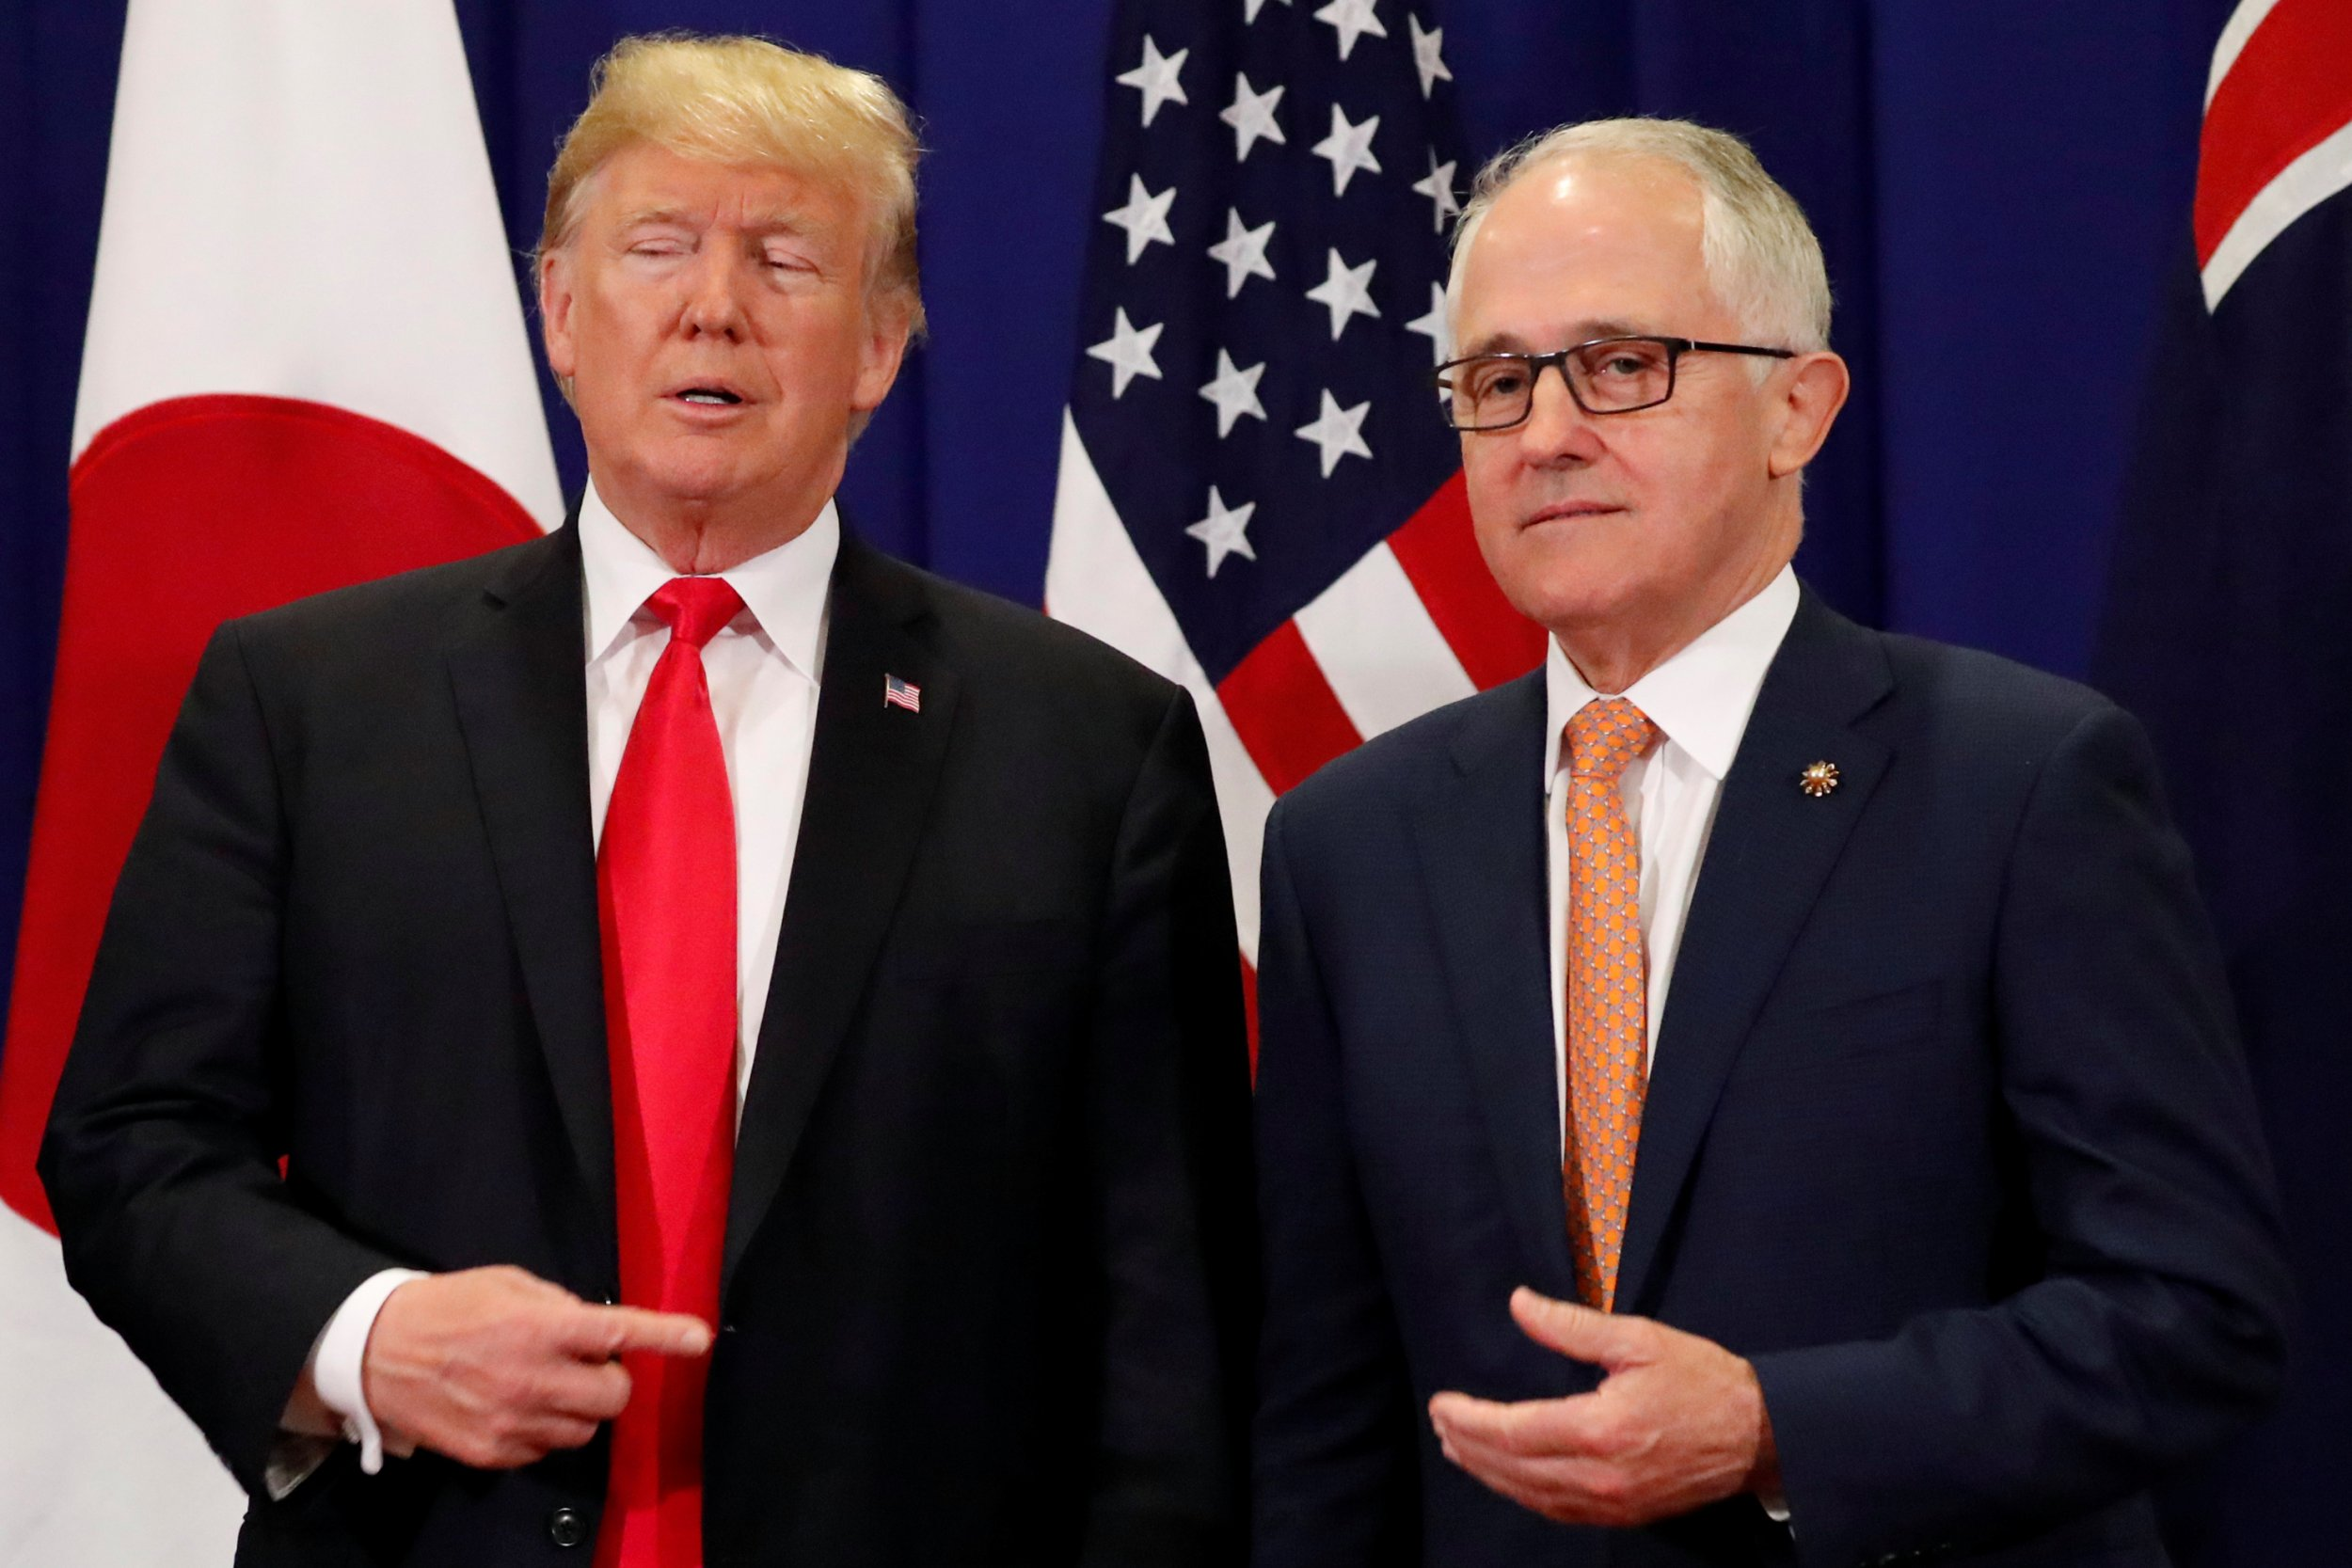 11_23_Malcolm_Turnbull_Donald_Trump